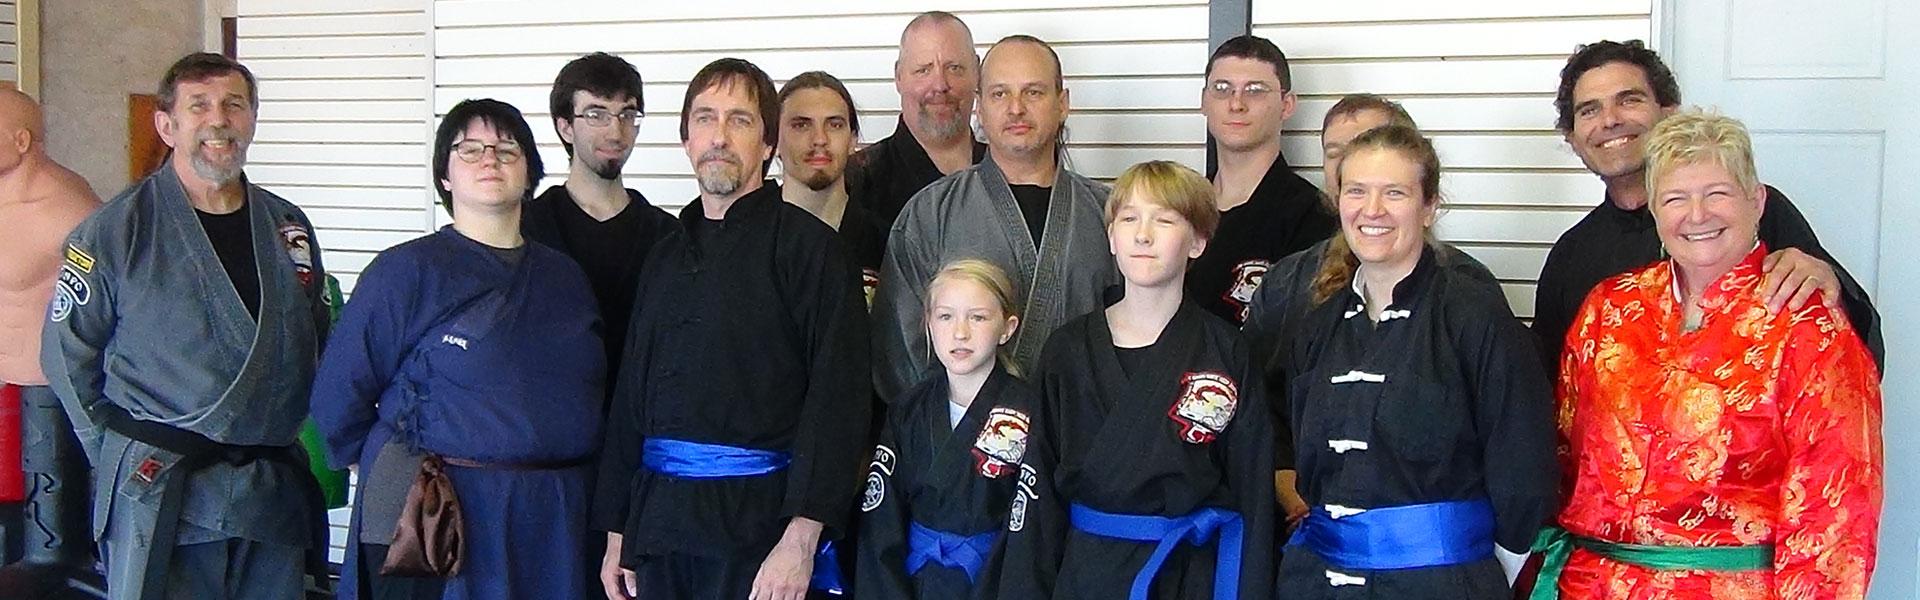 Home - Jim Adkins Martial Arts - Learn online or in dojo